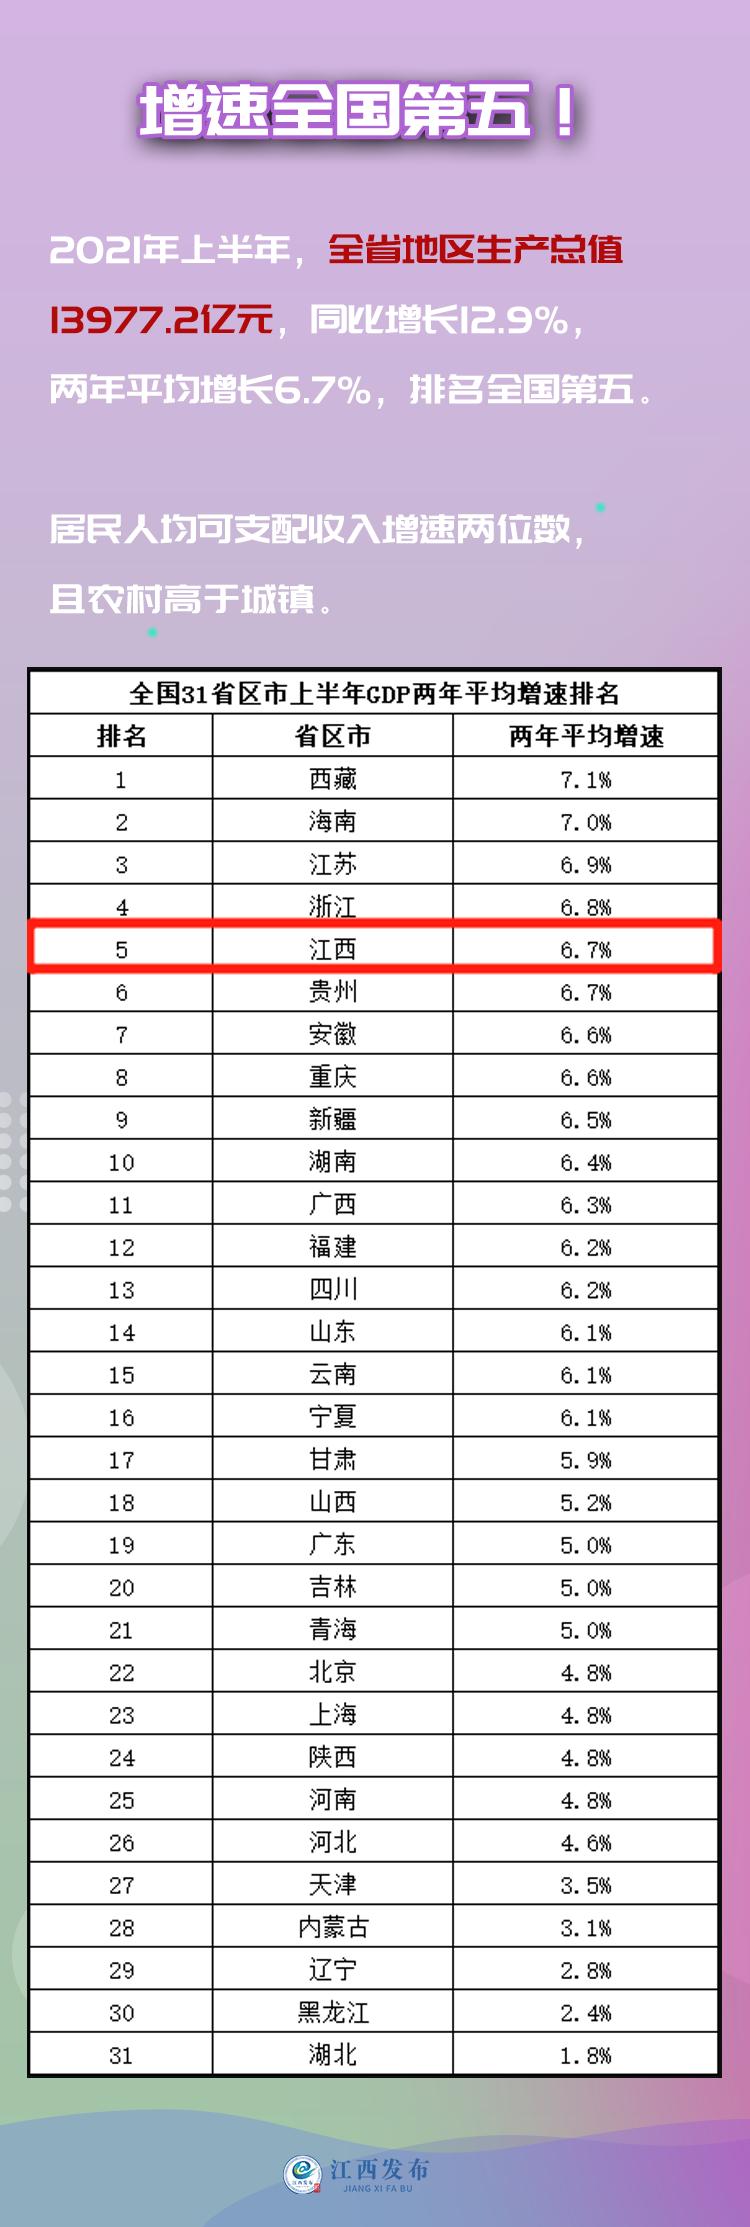 gdp超千亿的县_福建GDP超500亿元的县,多达11个,有你家乡么